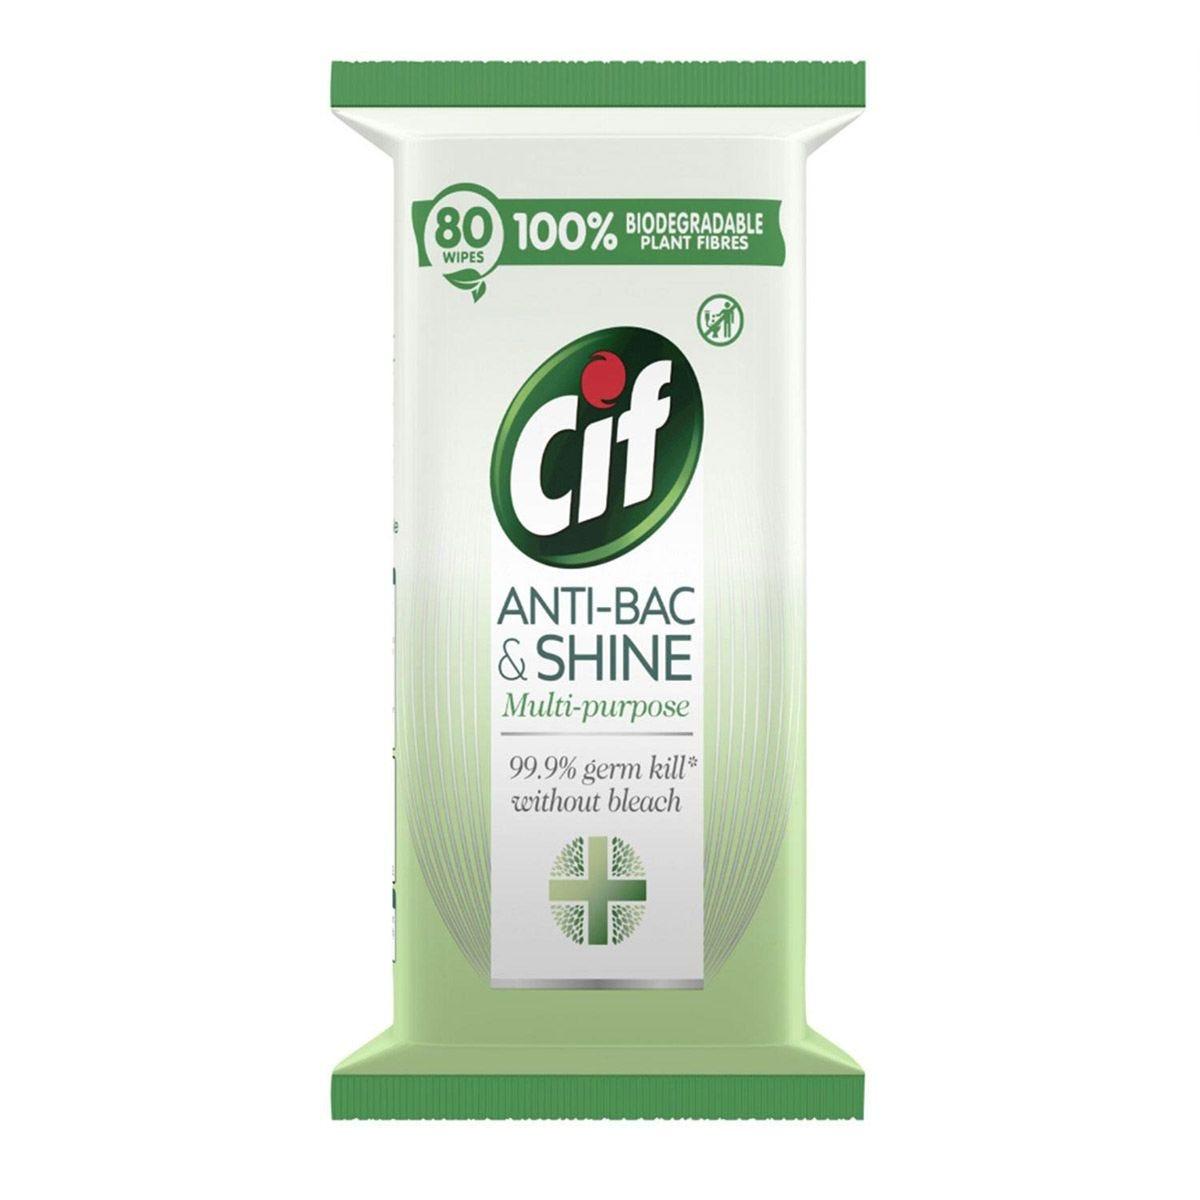 Cif Anti-Bac & Shine 80 Wipes x 3 Packs